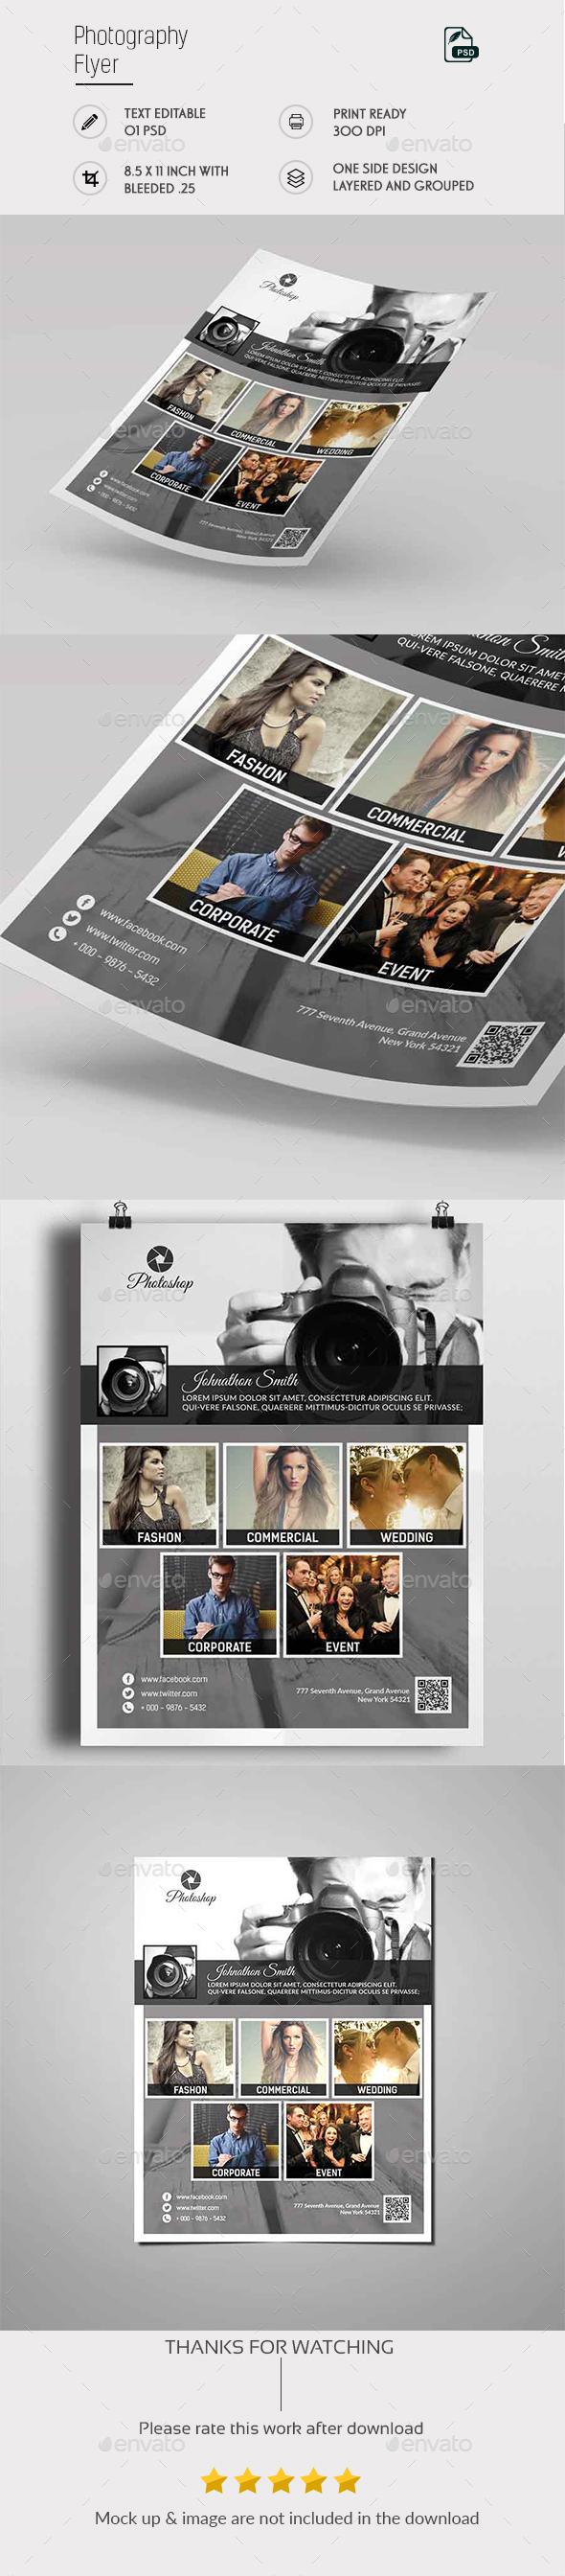 Photography Flyer Template - Flyers Print Templates